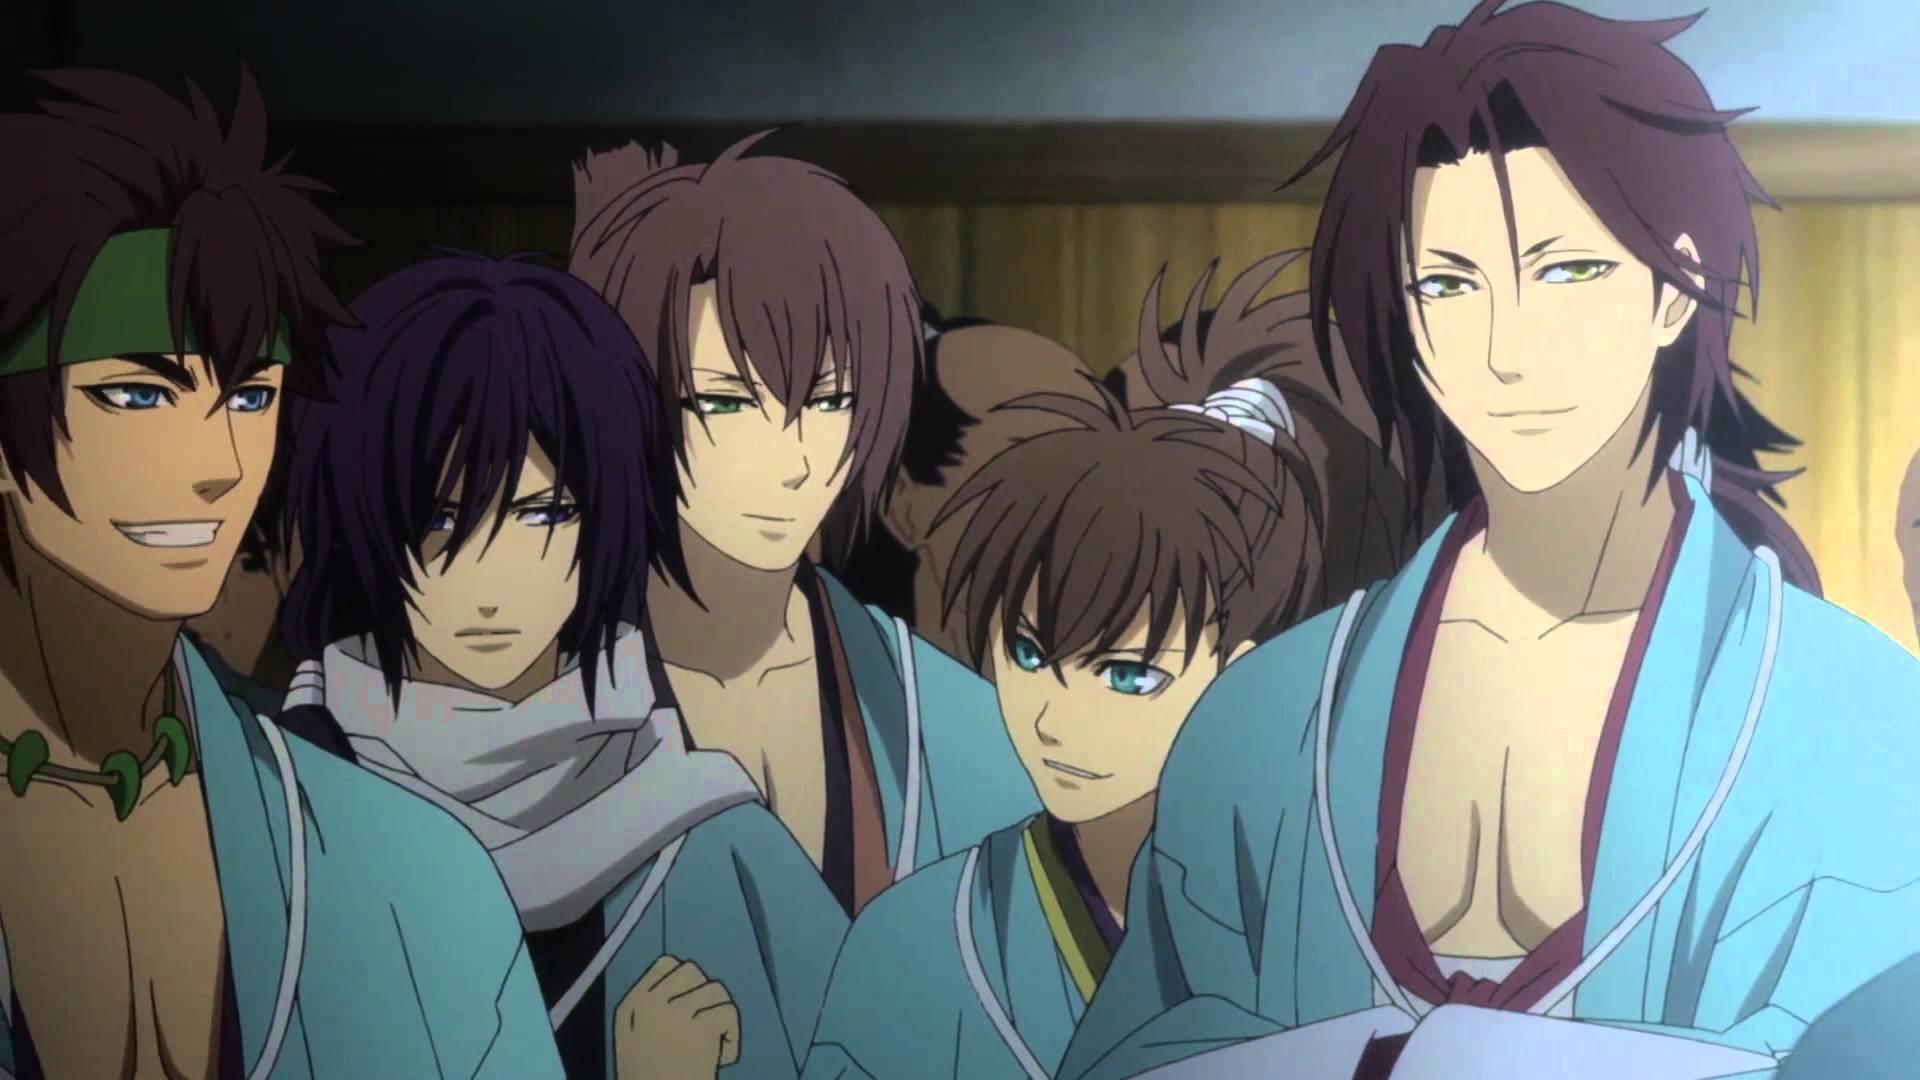 The Shinsengumi